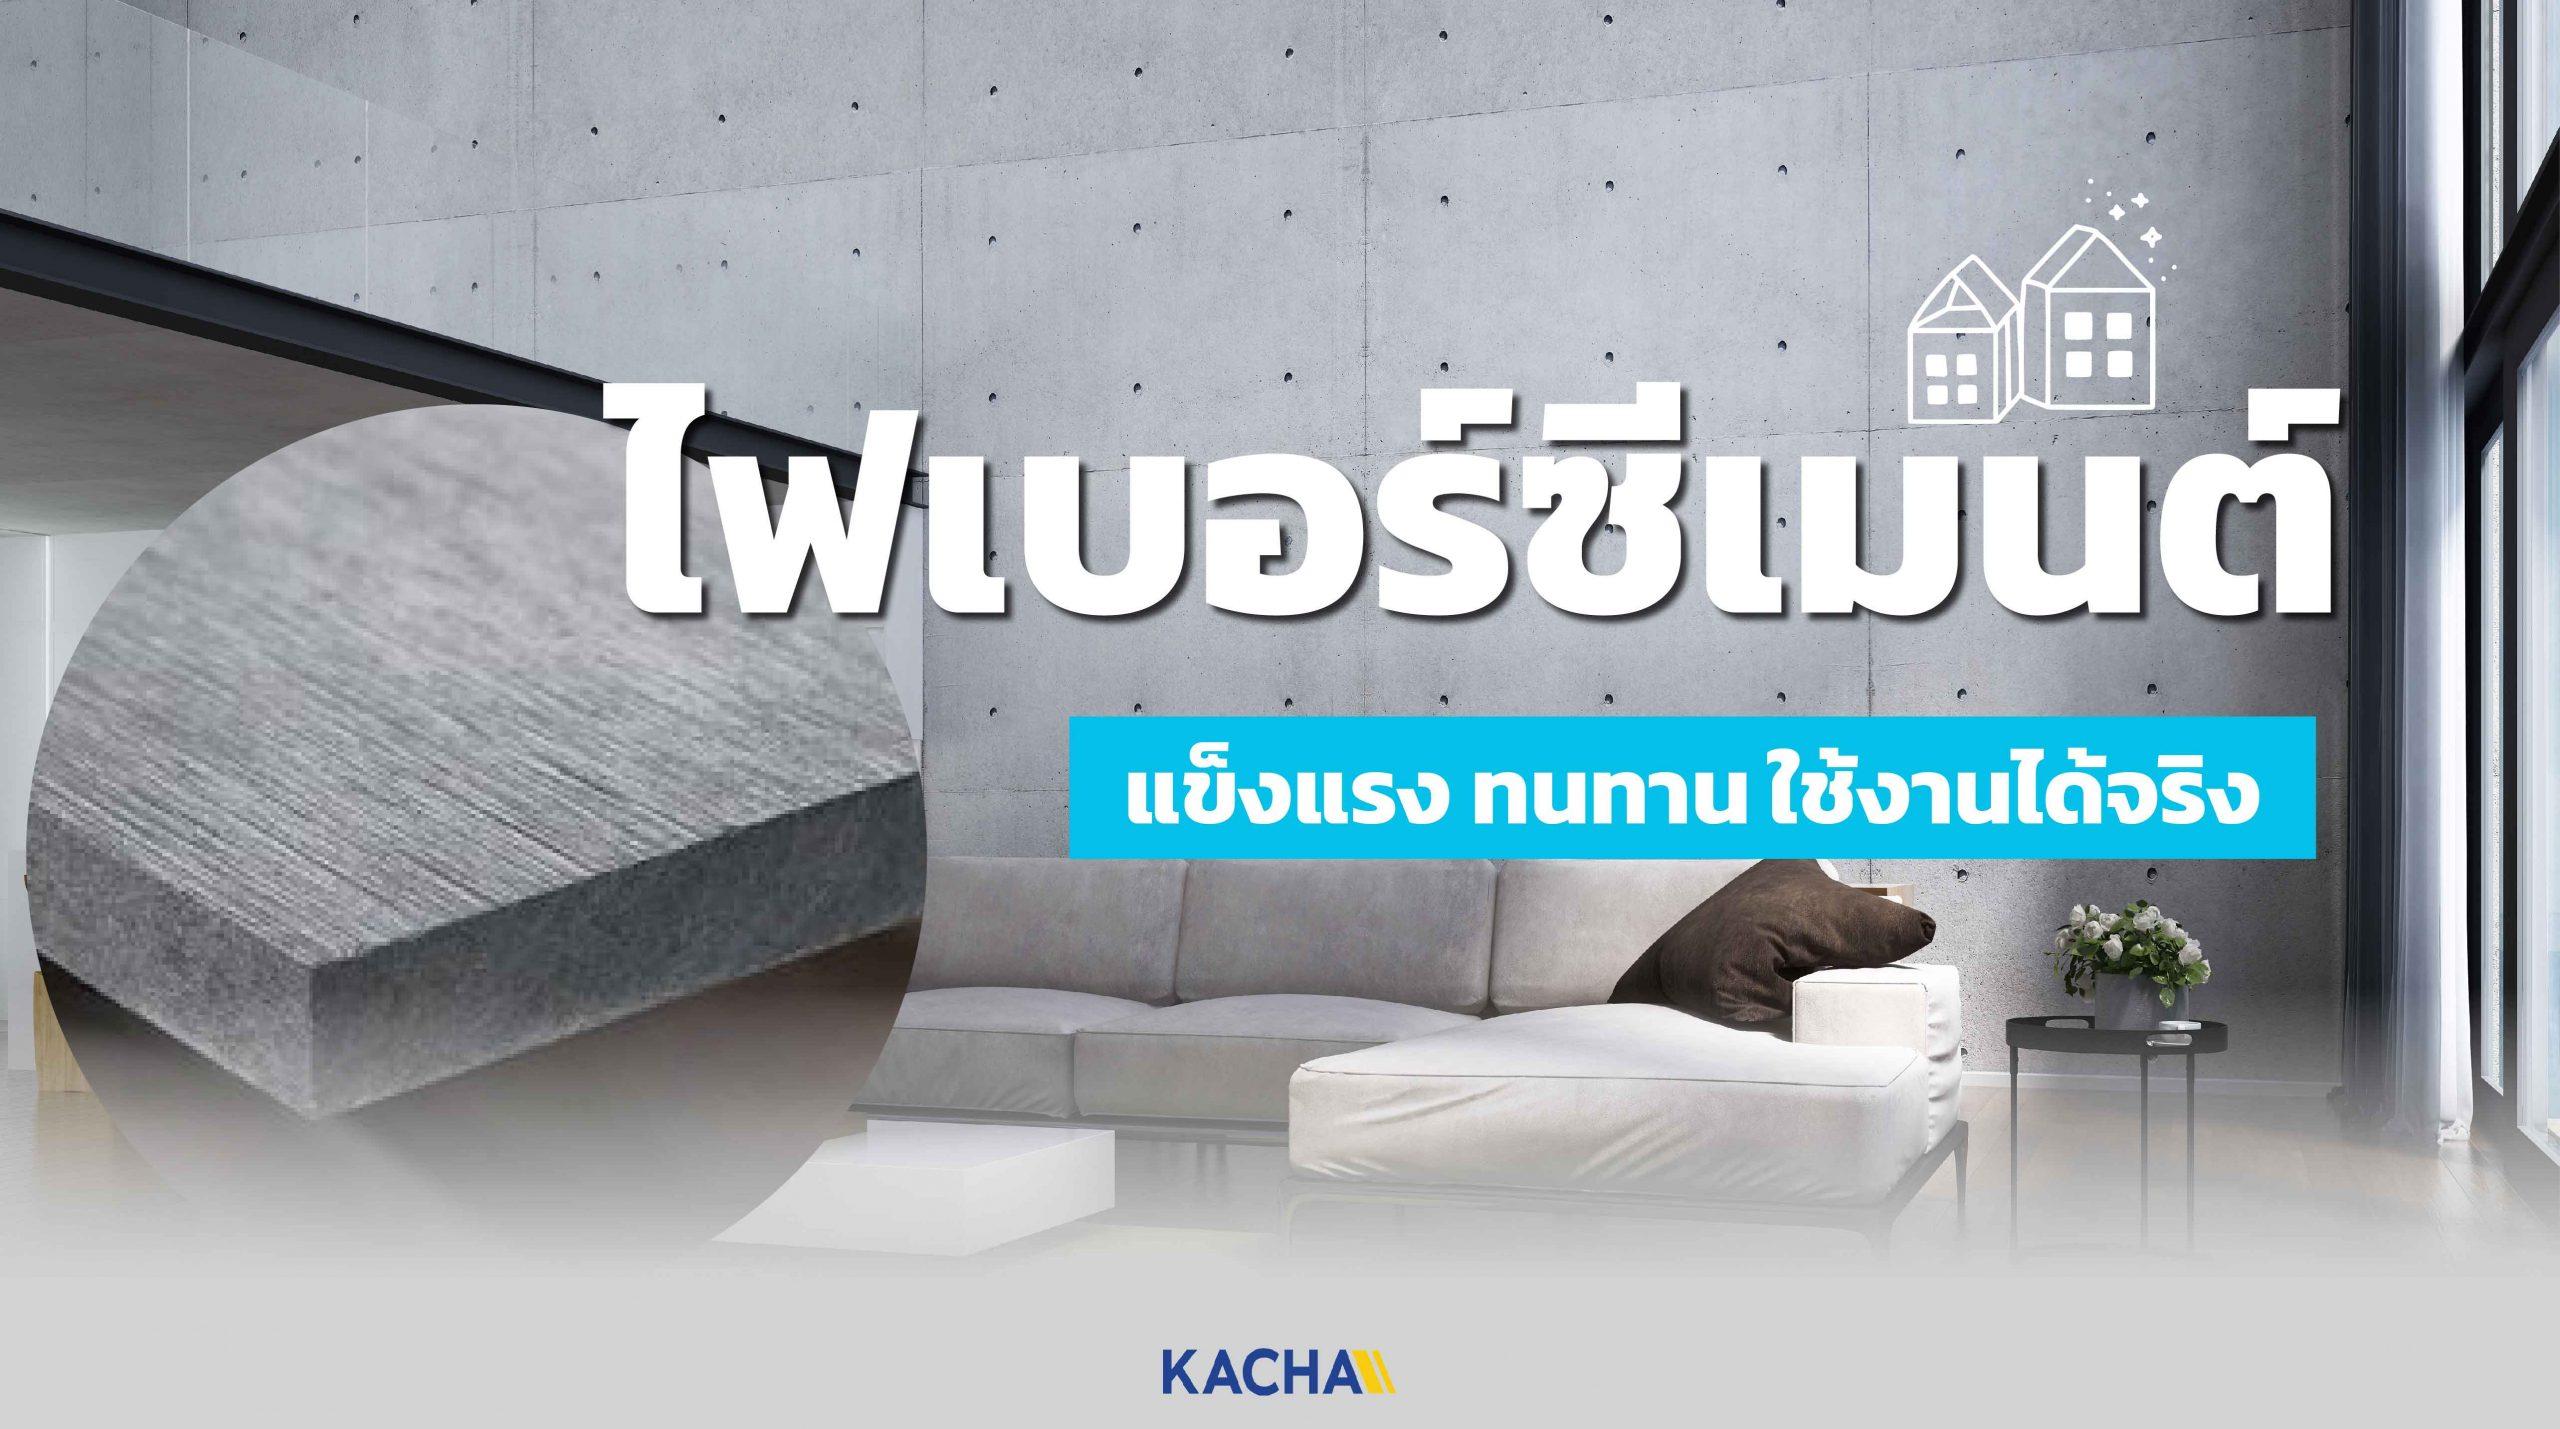 201214-Content-ไฟเบอร์ซีเมนต์-วัสดุทำผนัง-ฝ้าเพดาน-ทนทานใช้งานได้จริง-01